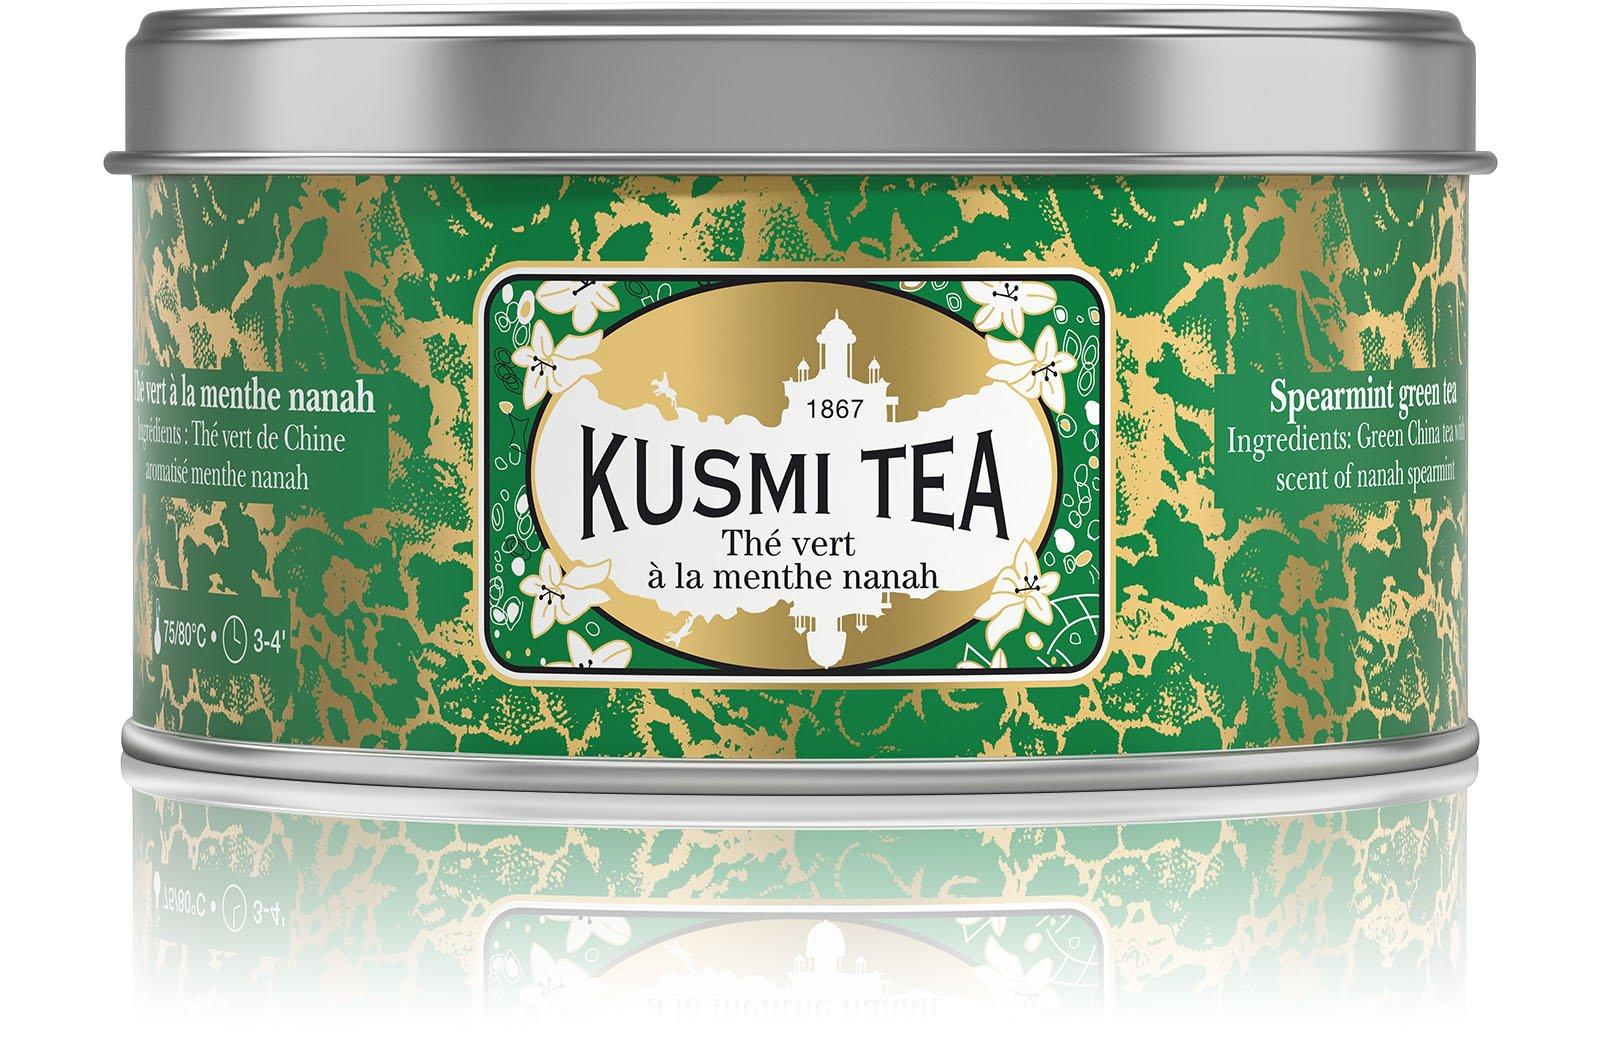 Kusmi Tea - Spearmint Green Tea - Refreshing Green Tea with Spearmint Leaves & Mint Essential Oils - 4.4oz Natural, Premium Loose Leaf Spearmint Green Tea in Eco-Friendly Tin (50 Servings)